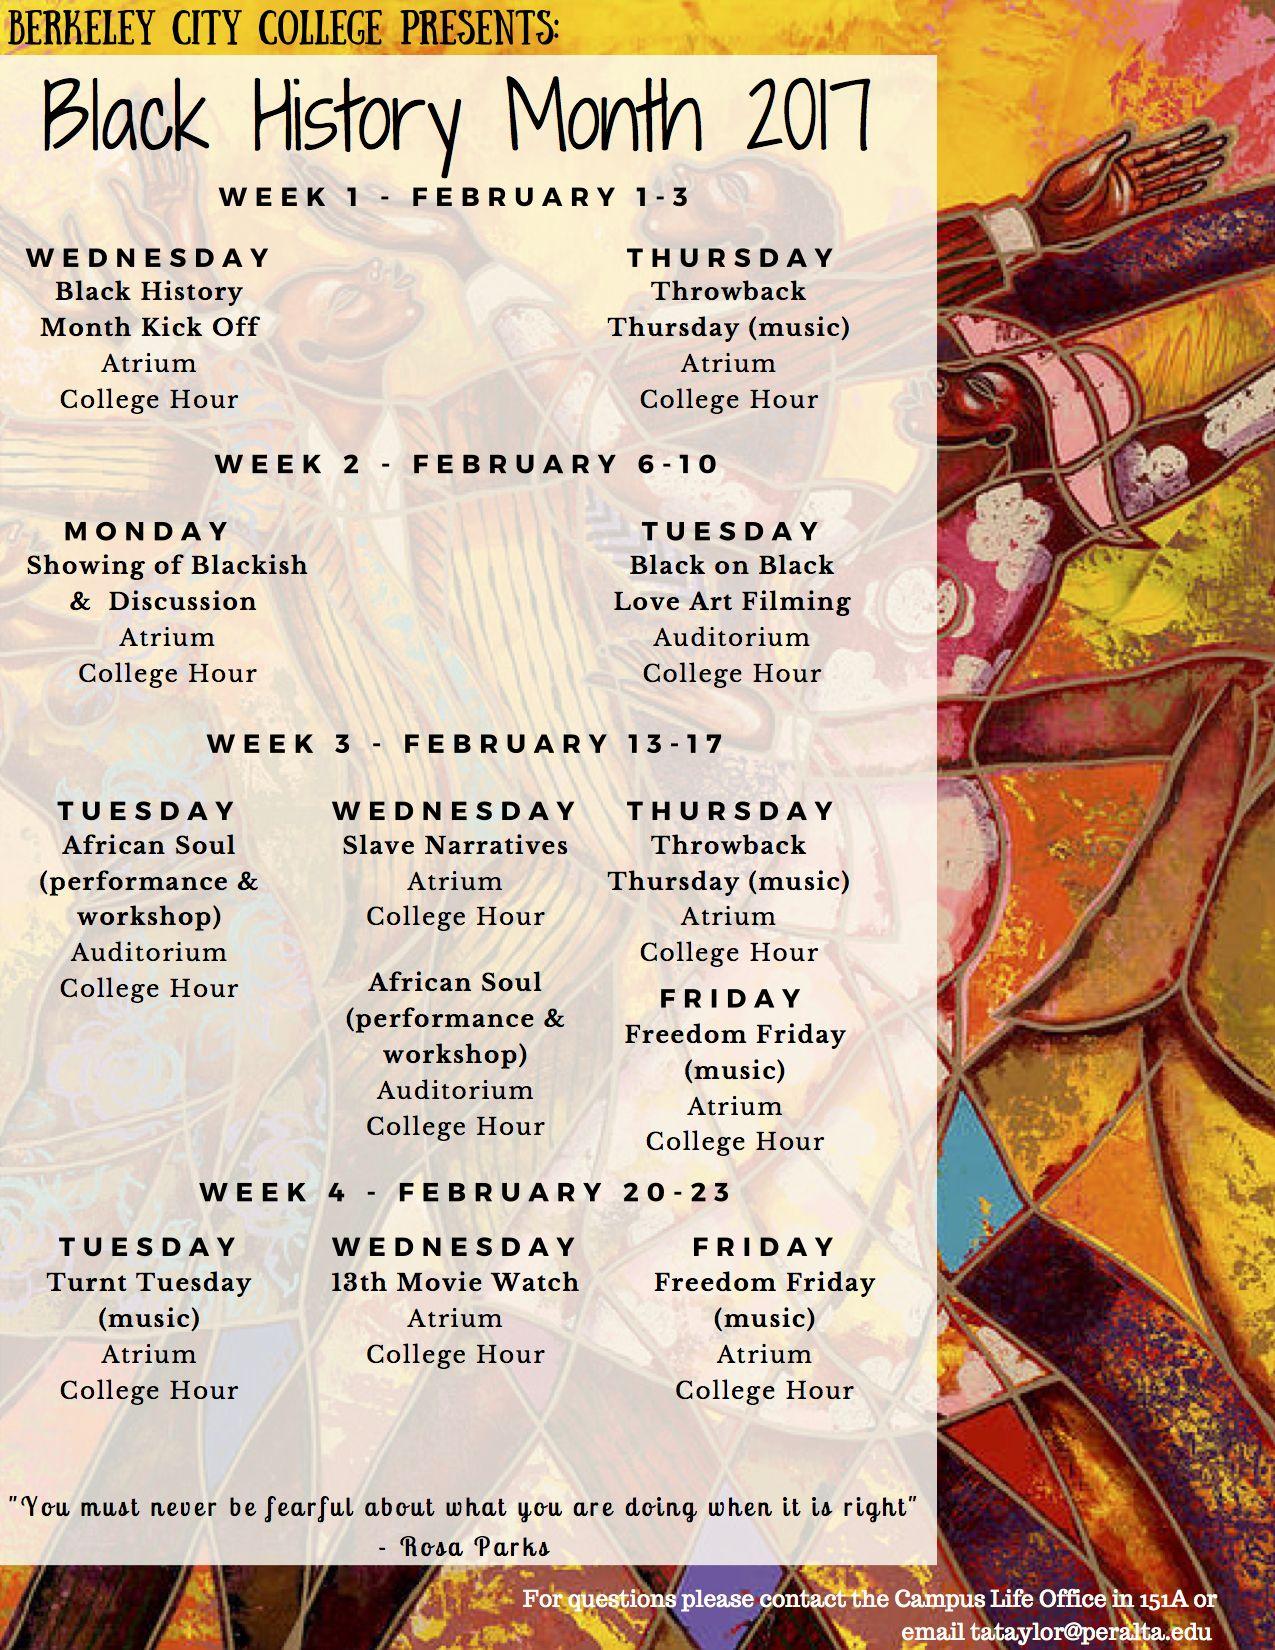 #BerkeleyCityCollege's #BlackHistoryMonth 2017 #CollegeHour #EventCalendar